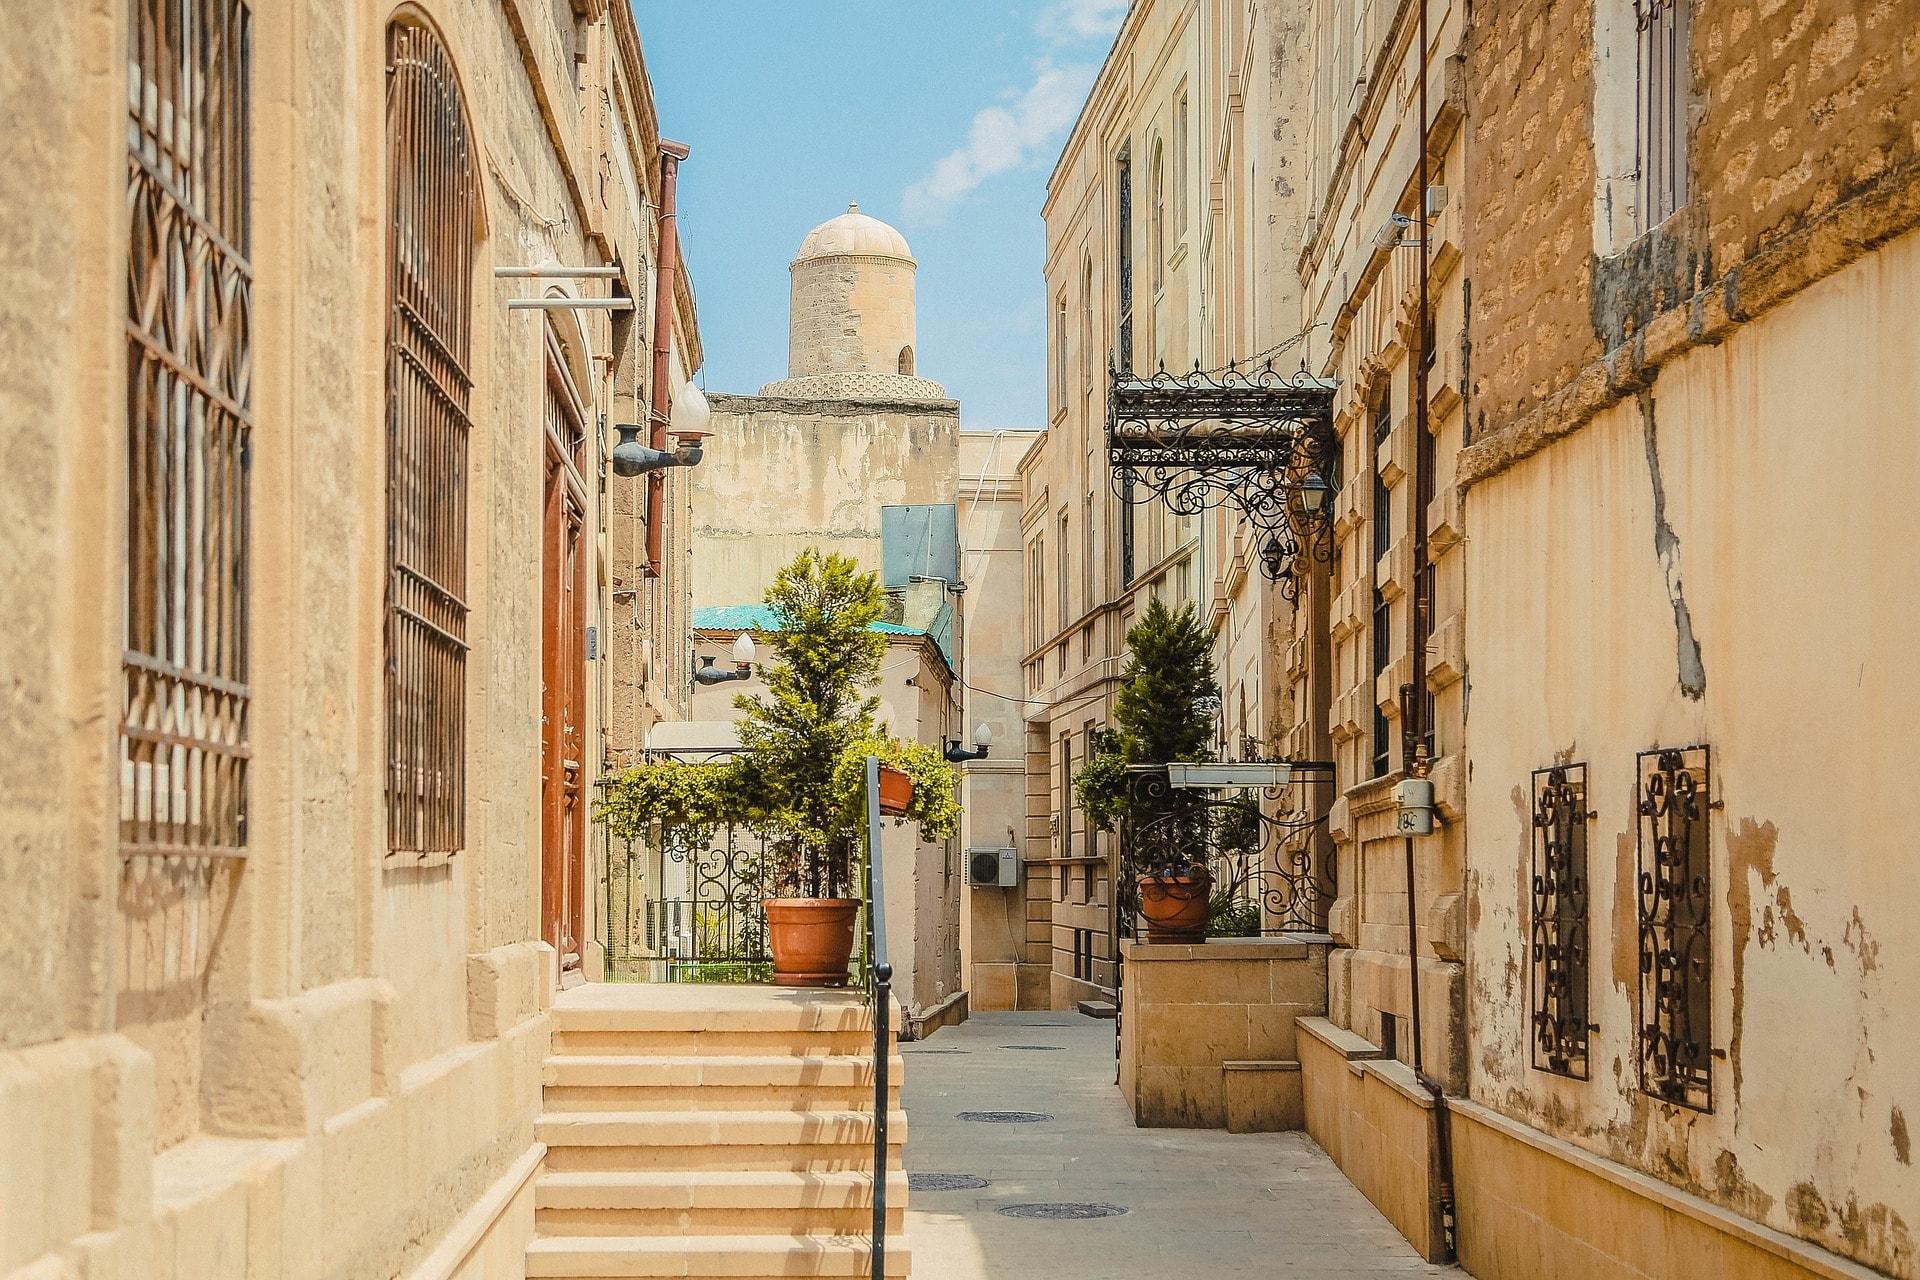 The old town on Baku Azerbaijan